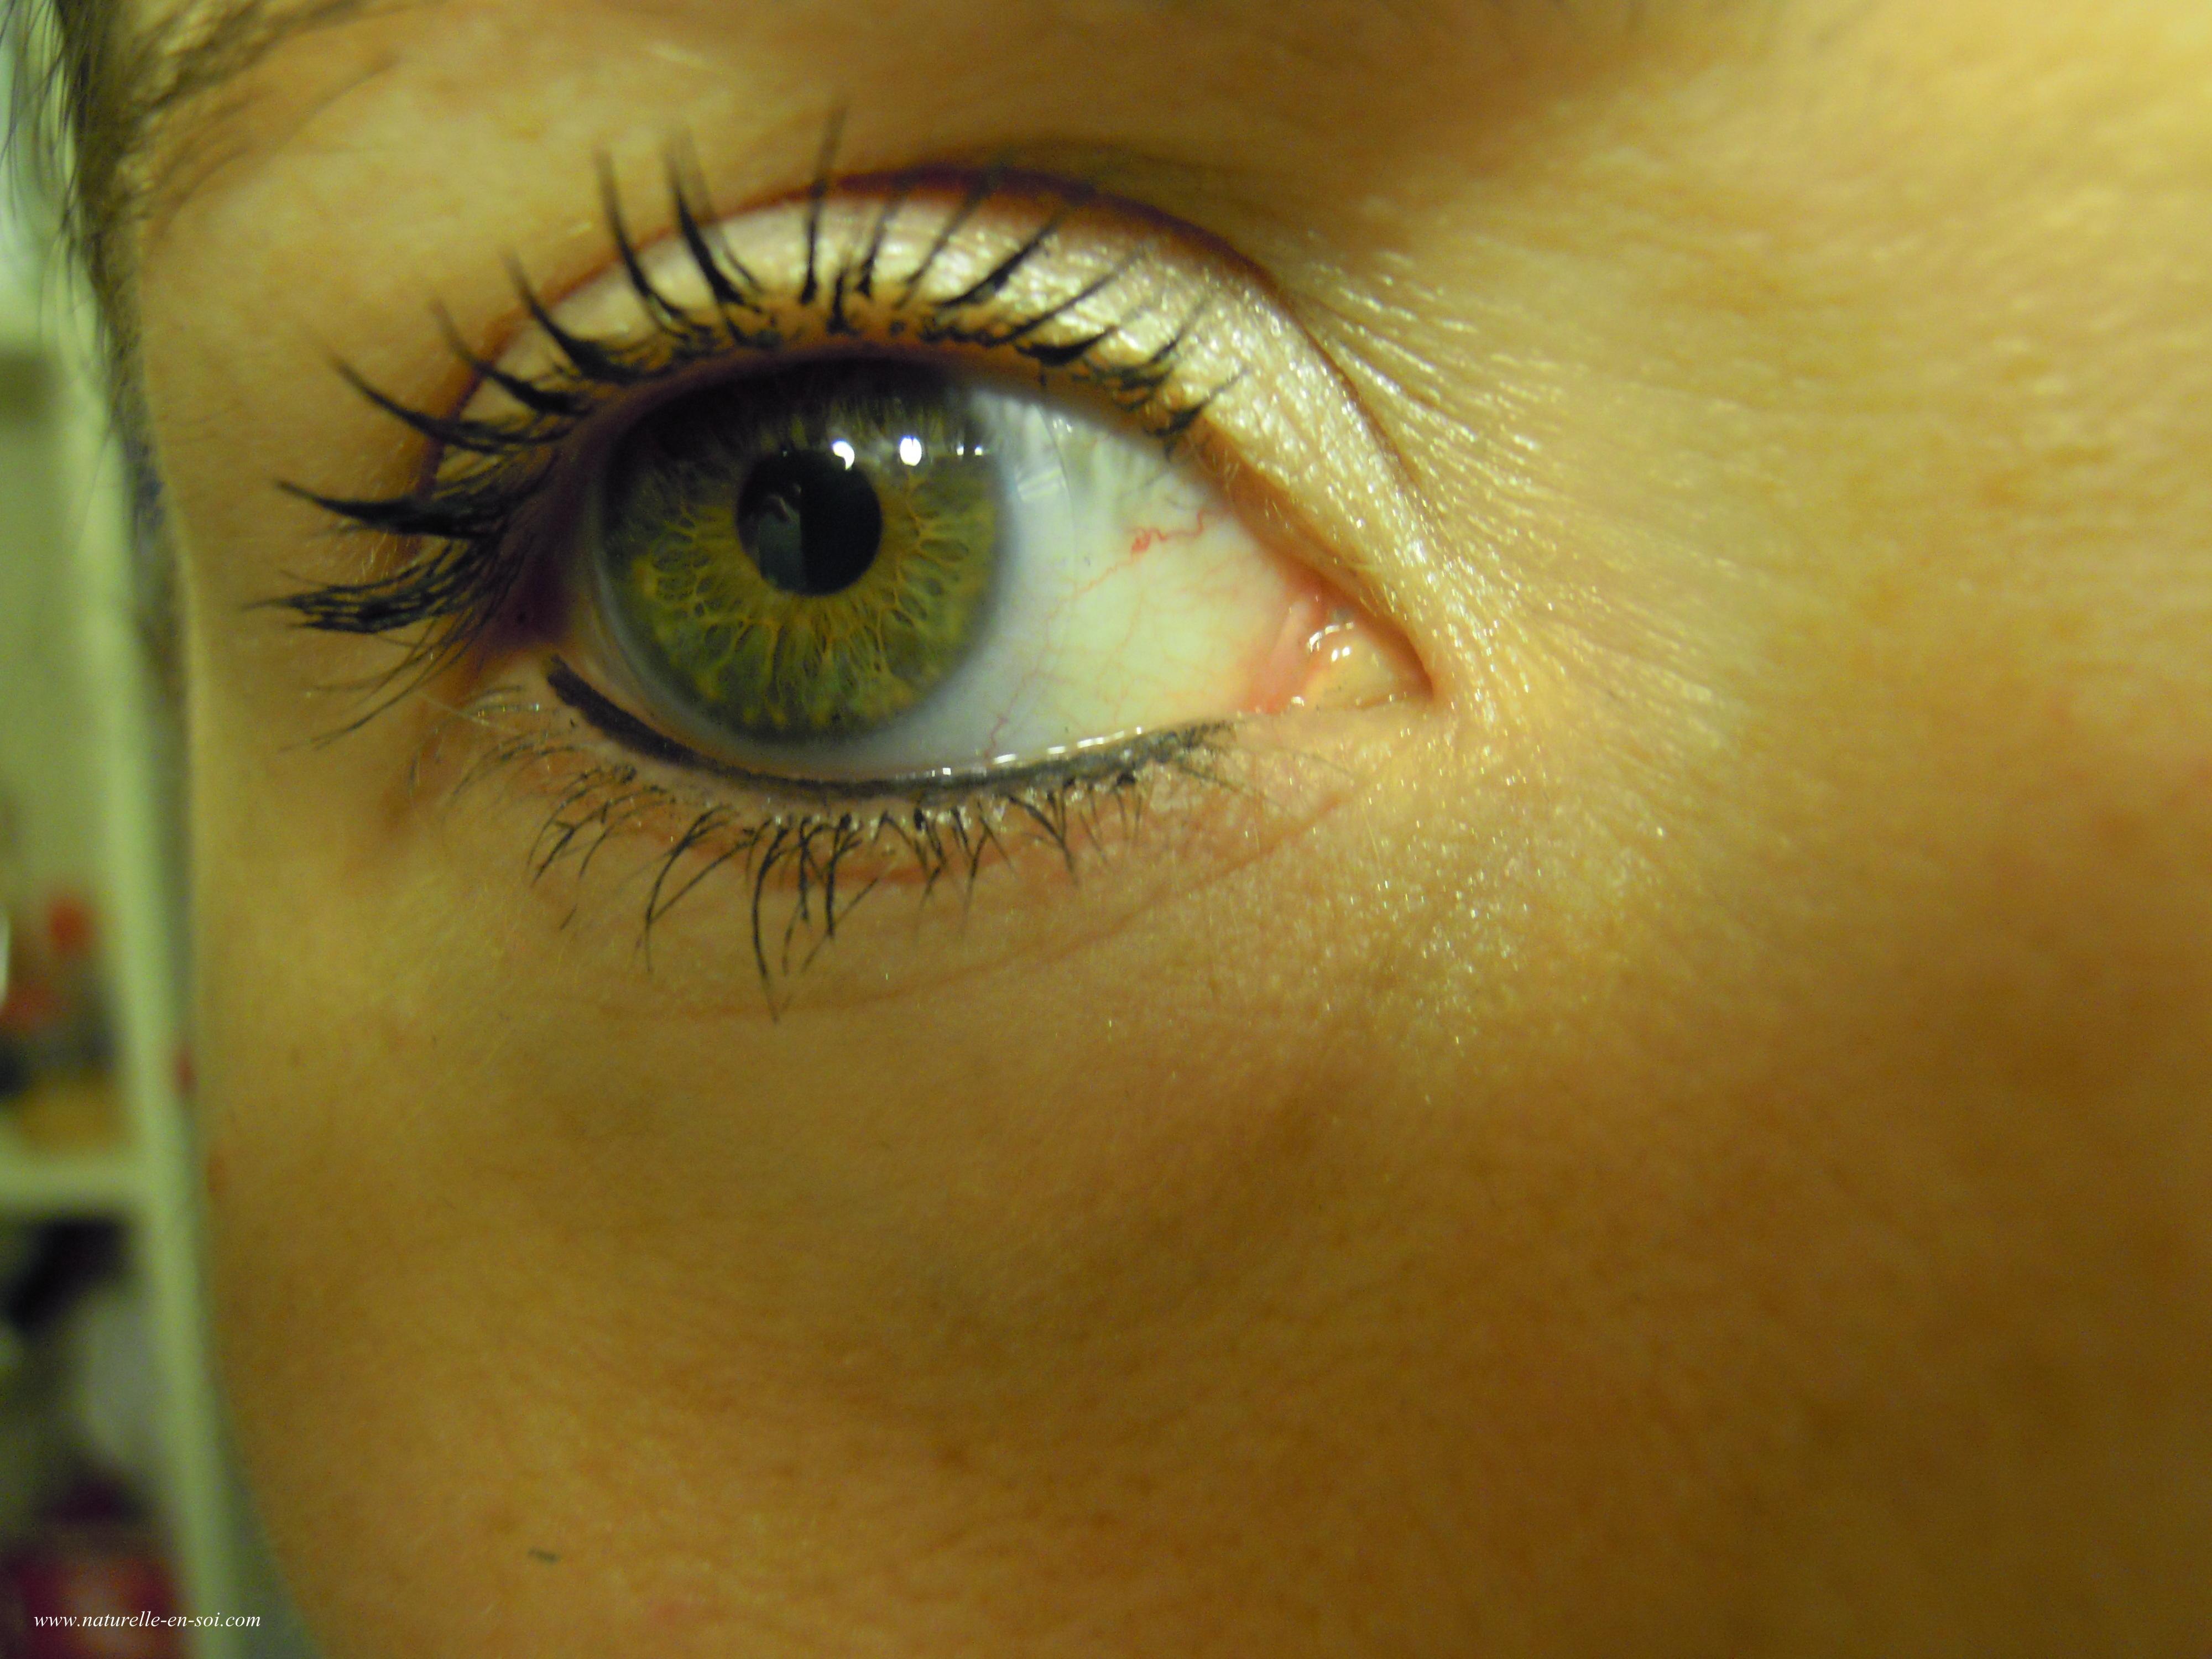 mascara couleur Caramel oeil droit